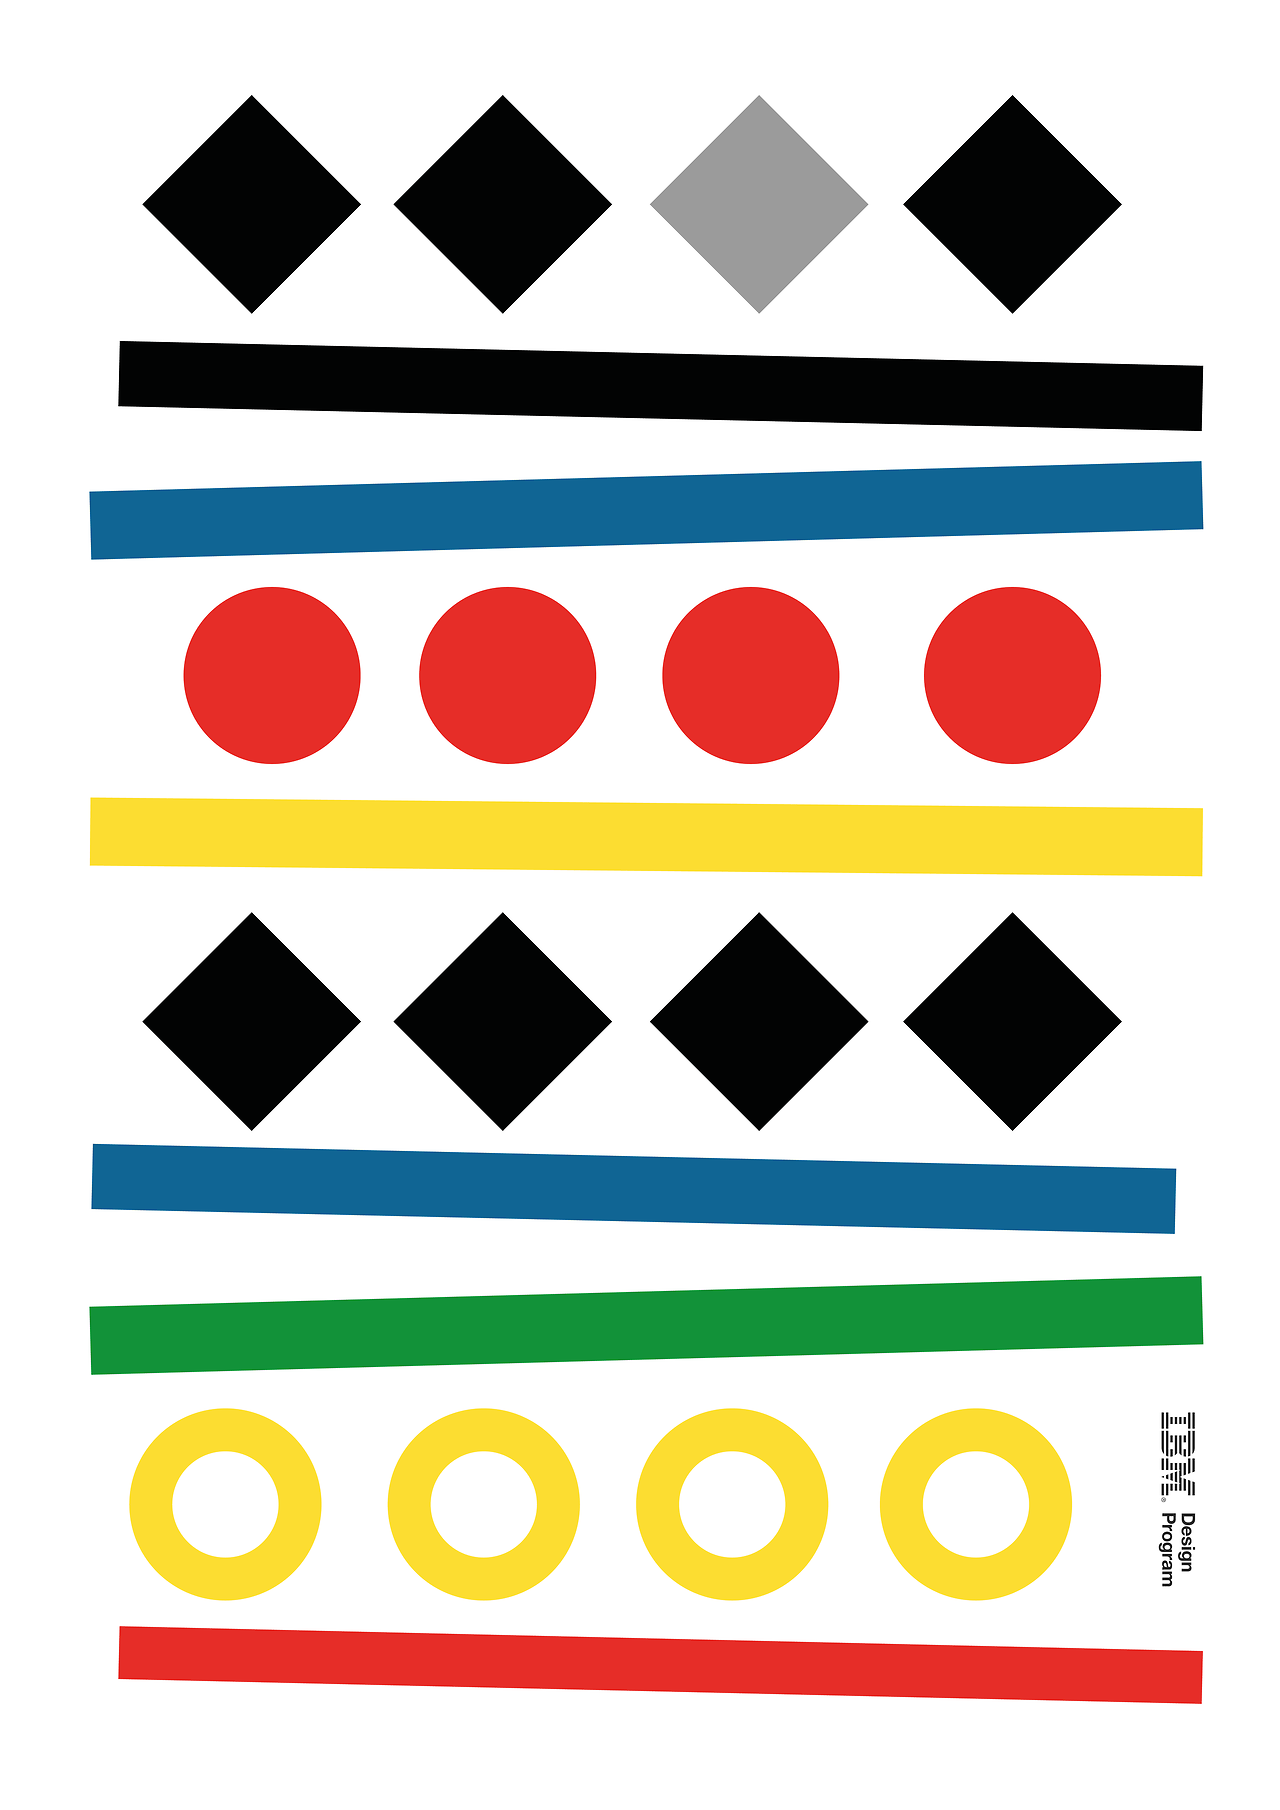 good designs good business 5